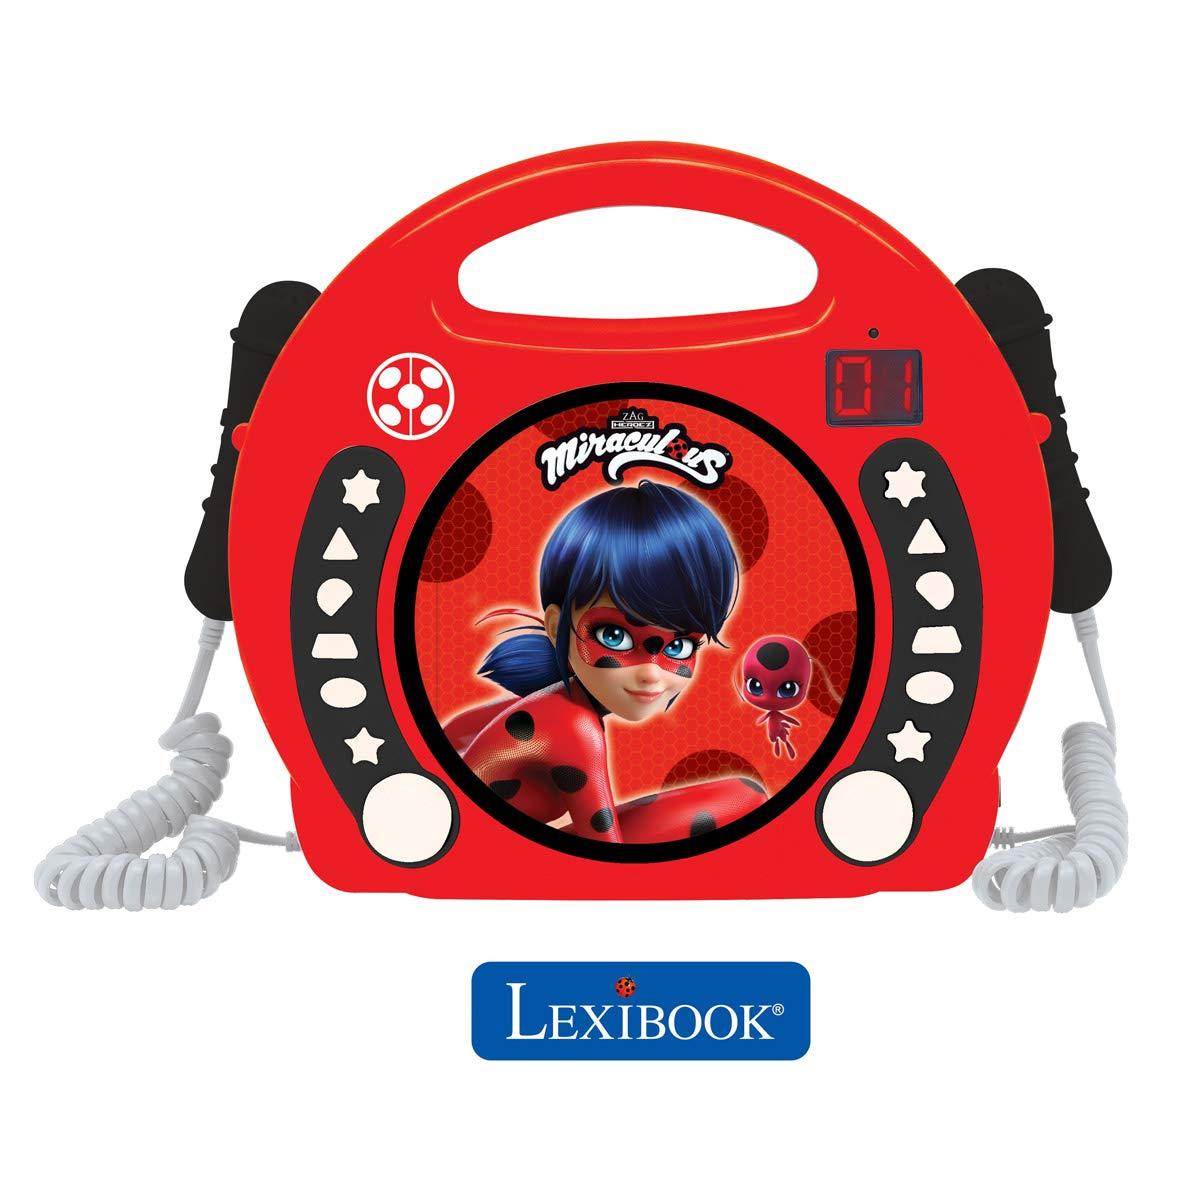 LEXiBOOK Miraculous Ladybug Radio CD, Programming Function, Headphones Jack, for Kids, with Power Supply or Batteries, Red/Black, RCDK100MI by LEXiBOOK (Image #2)